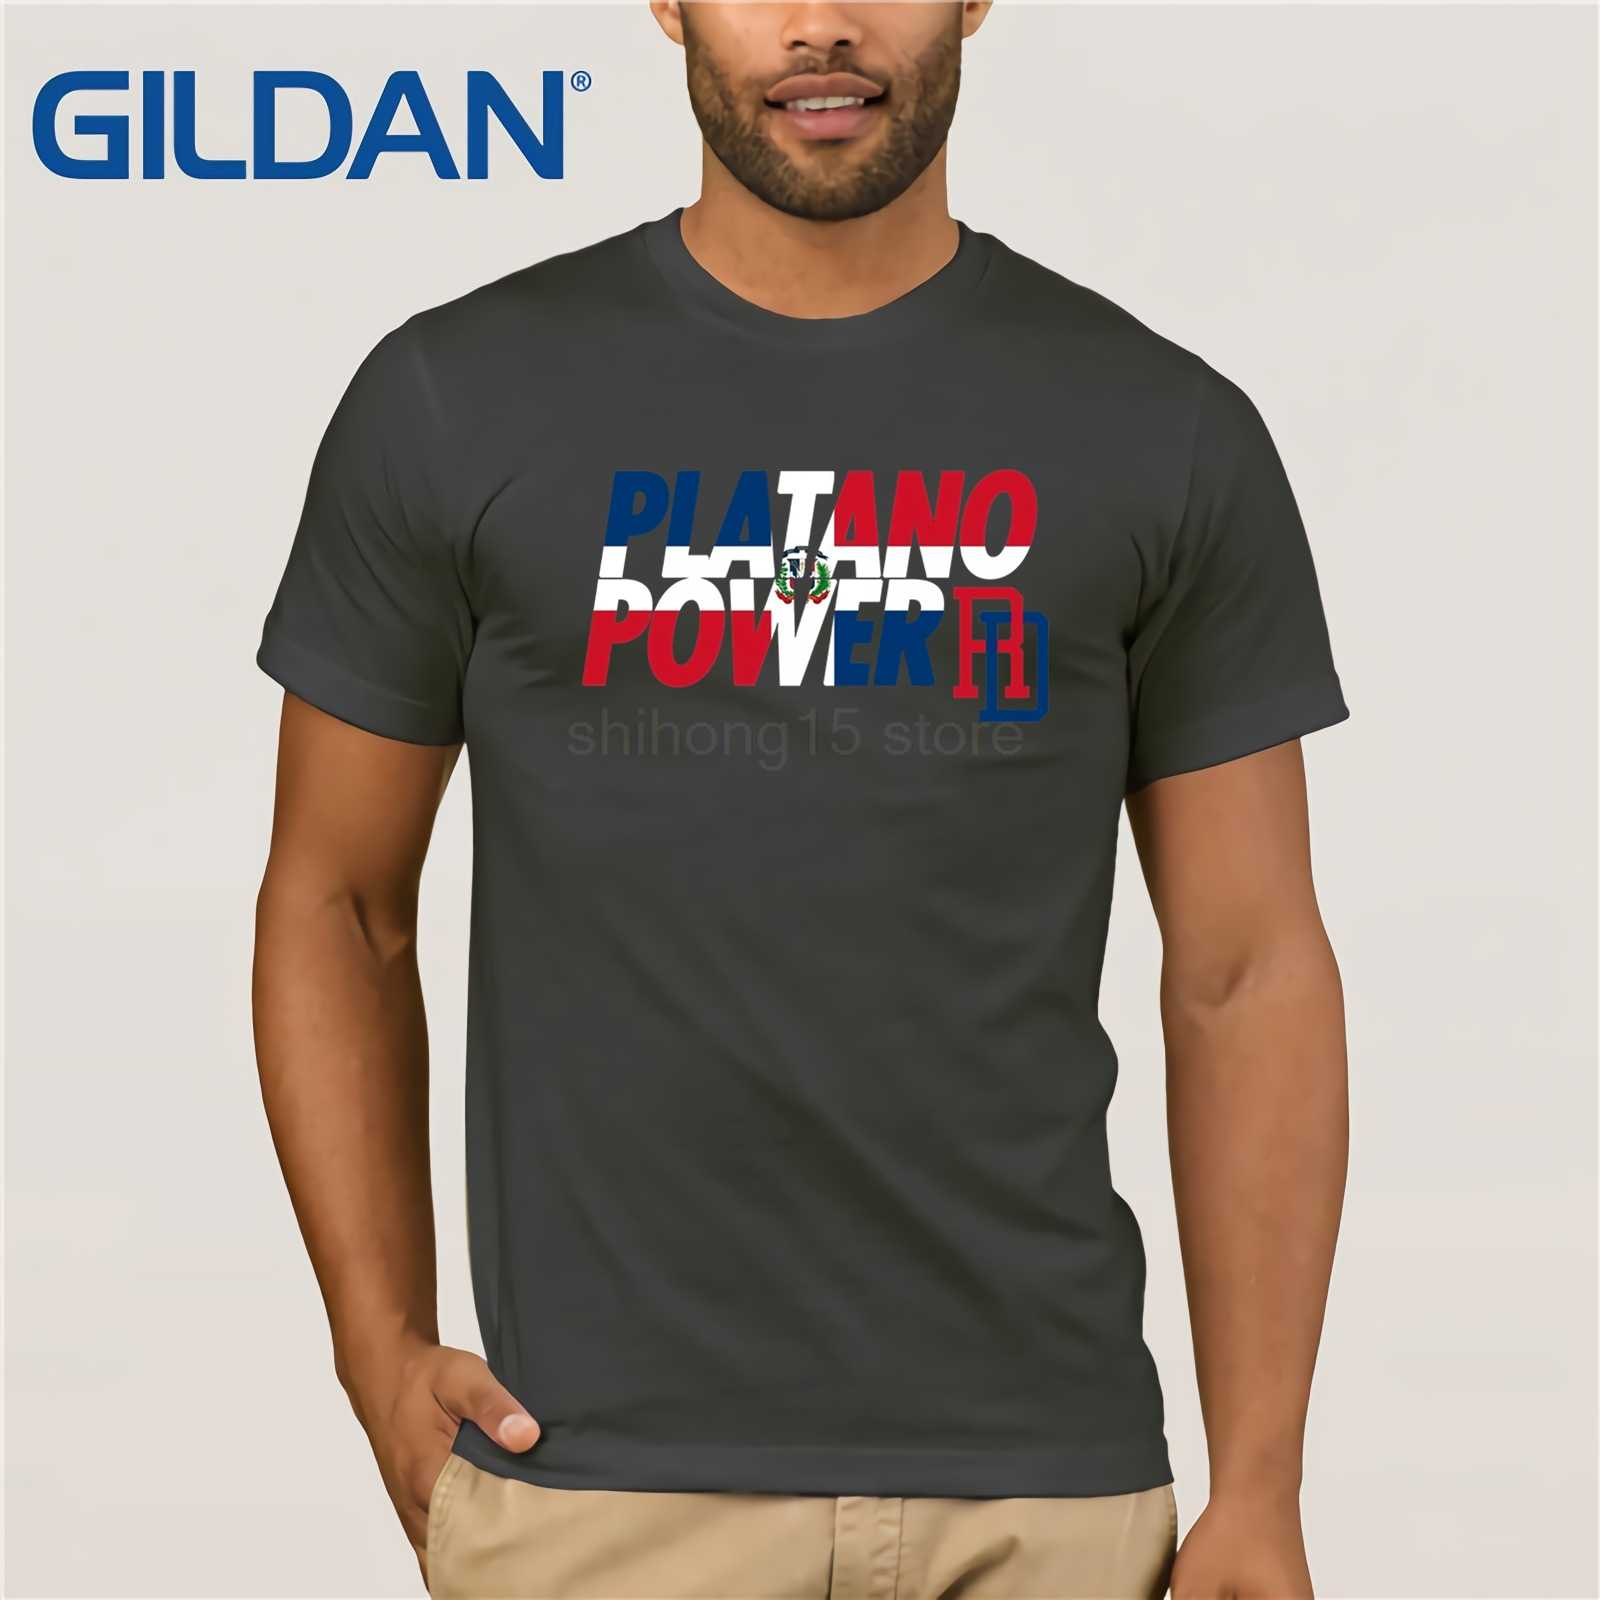 4bd06d15 ... Mens DOMINICAN REPUBLIC BASEBALL TEAM SUPPORT SHIRT PLATANO POWER XL  Black Design Style New Fashion Short ...